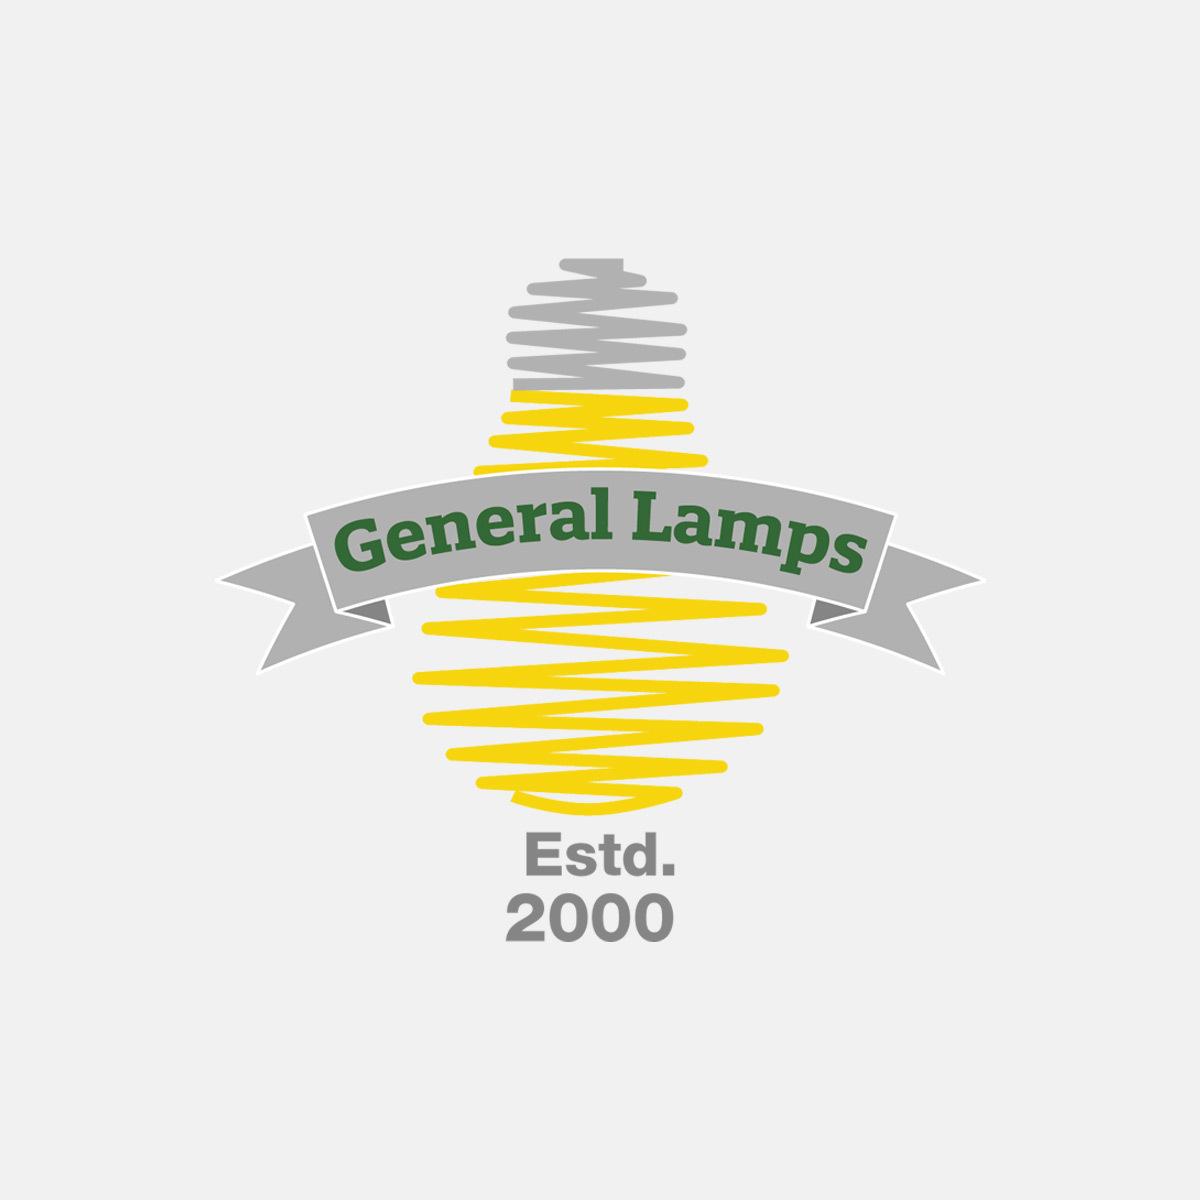 Theatre Lamp T27 T26 GCS 240V 650W GY9.5